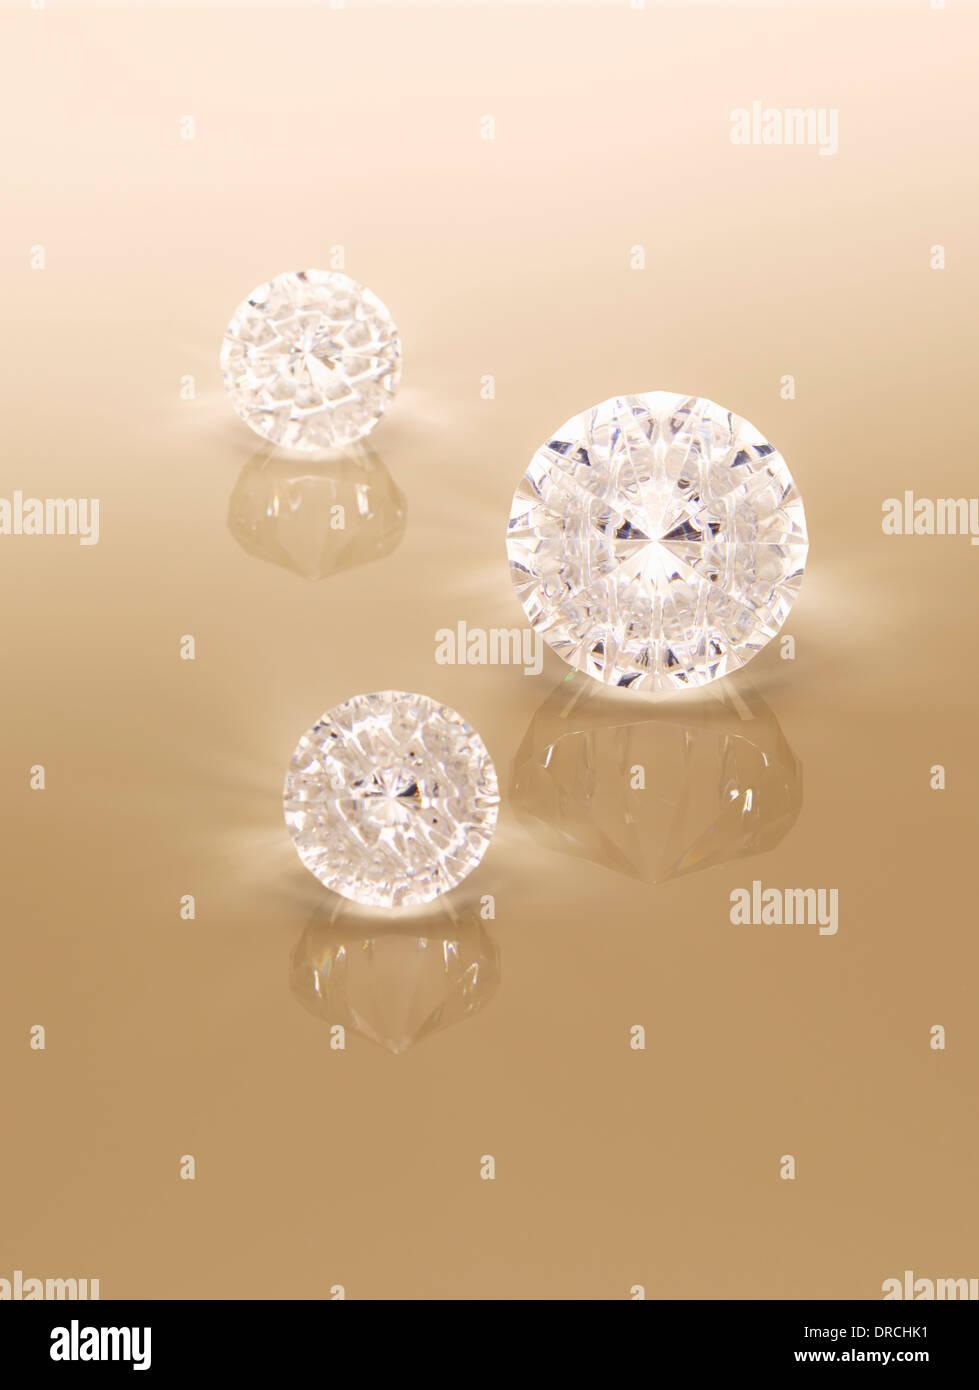 Close up of diamonds - Stock Image